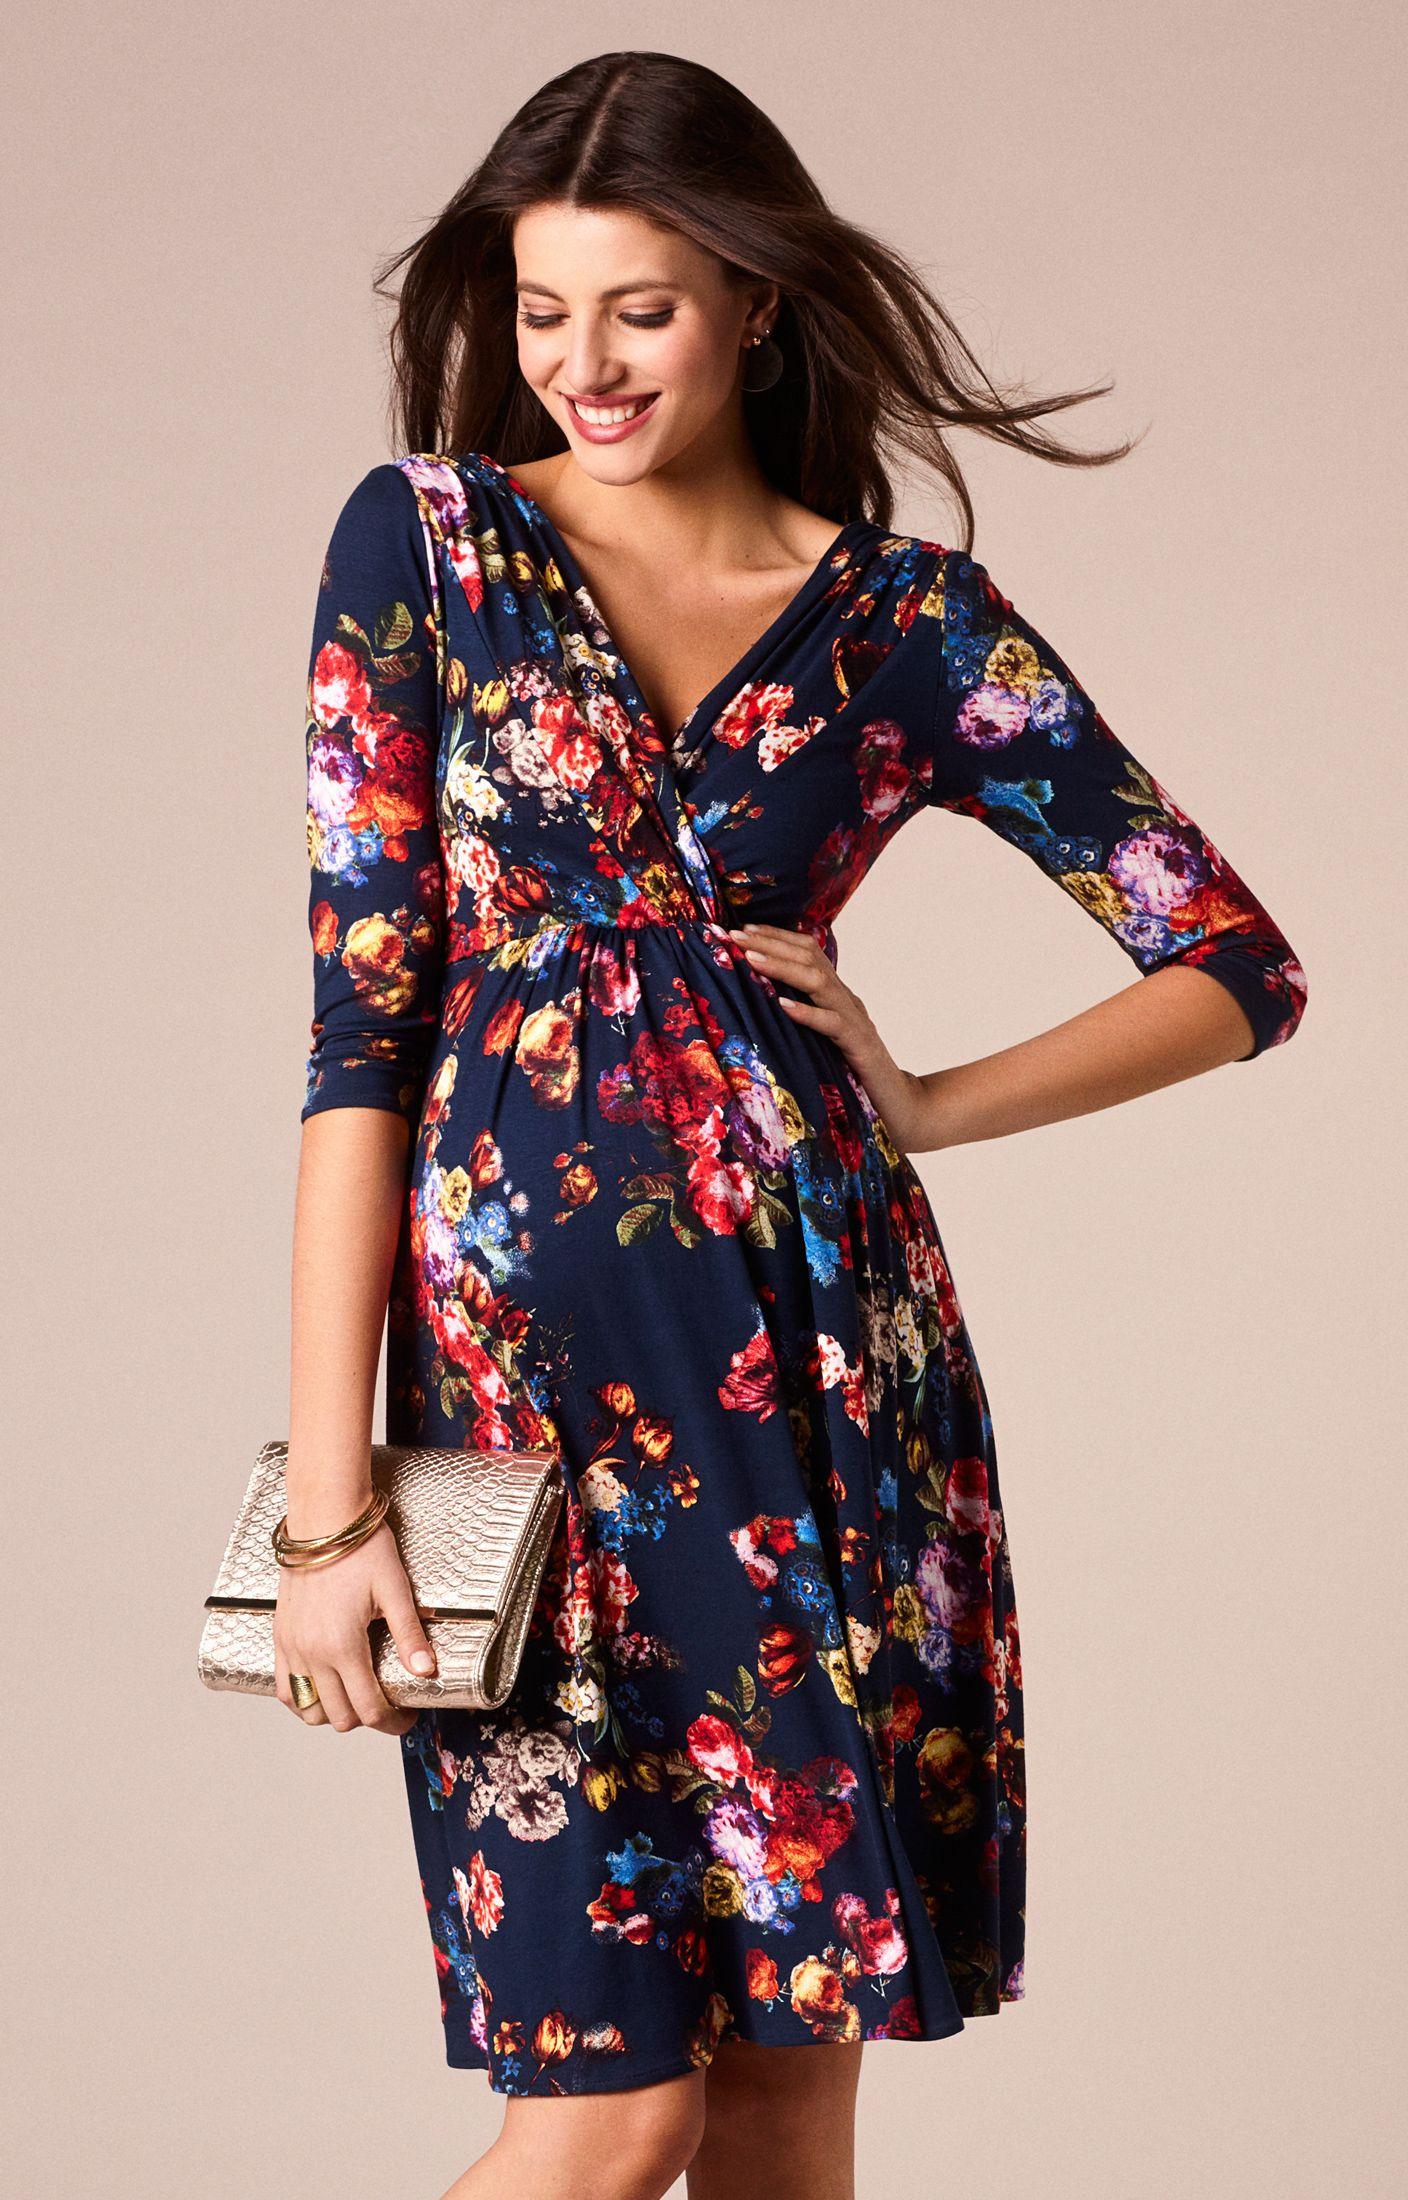 fbe64fc1e9 Willow Maternity Dress Midnight Garden by Tiffany Rose